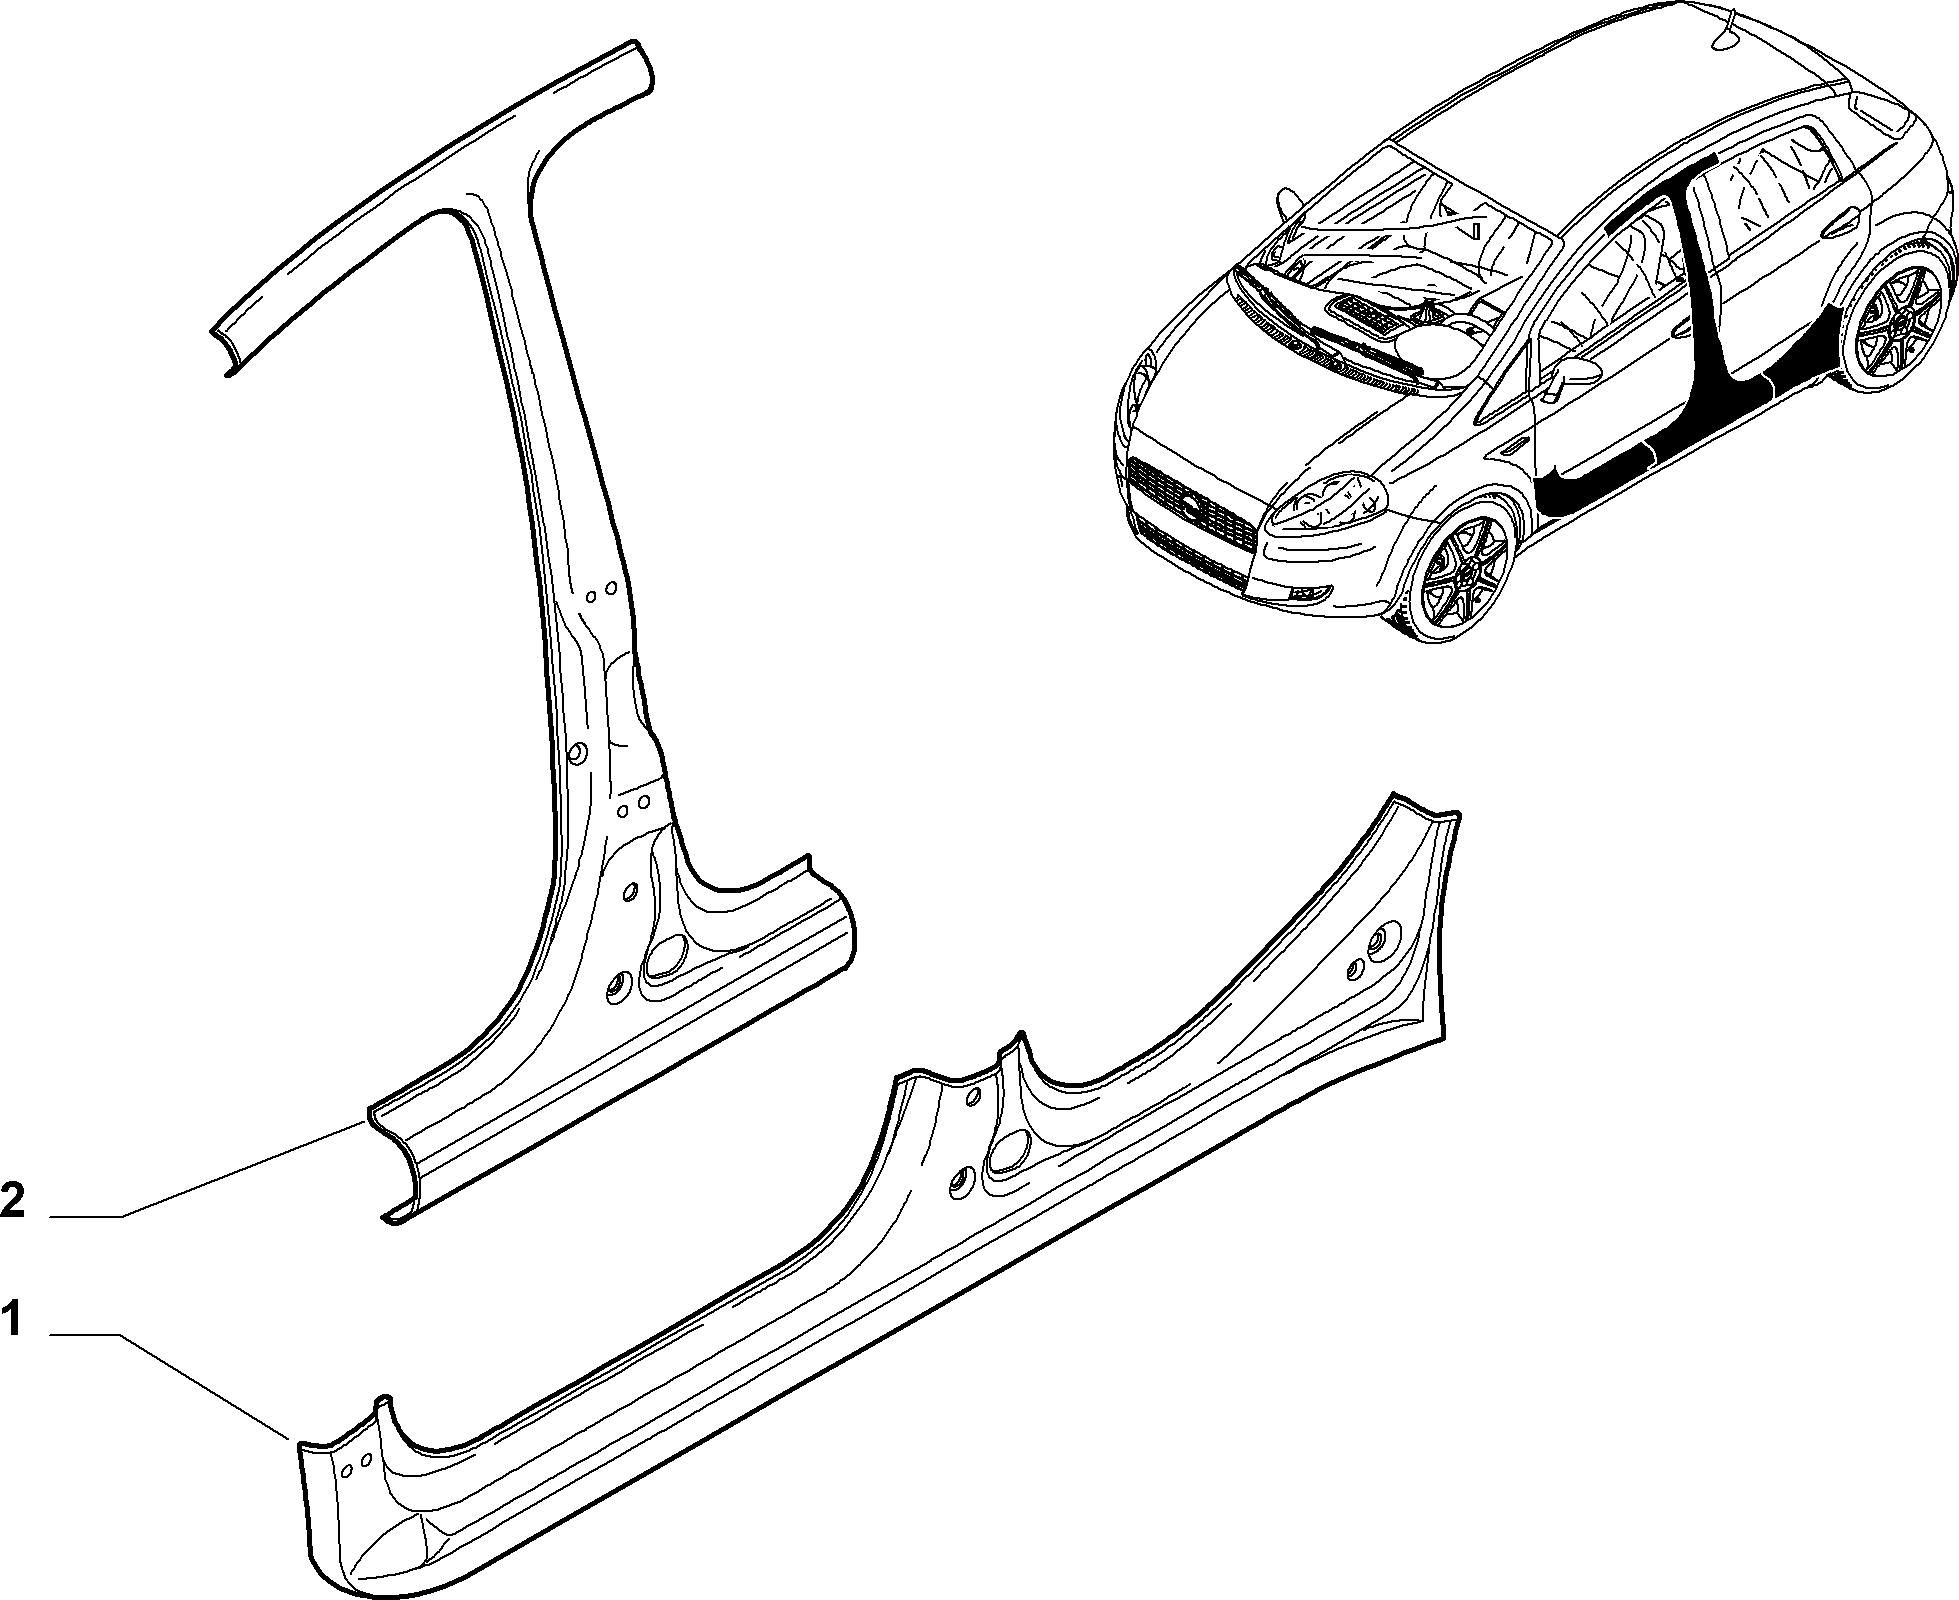 70019-025 SIDE PANEL (CENTRAL)